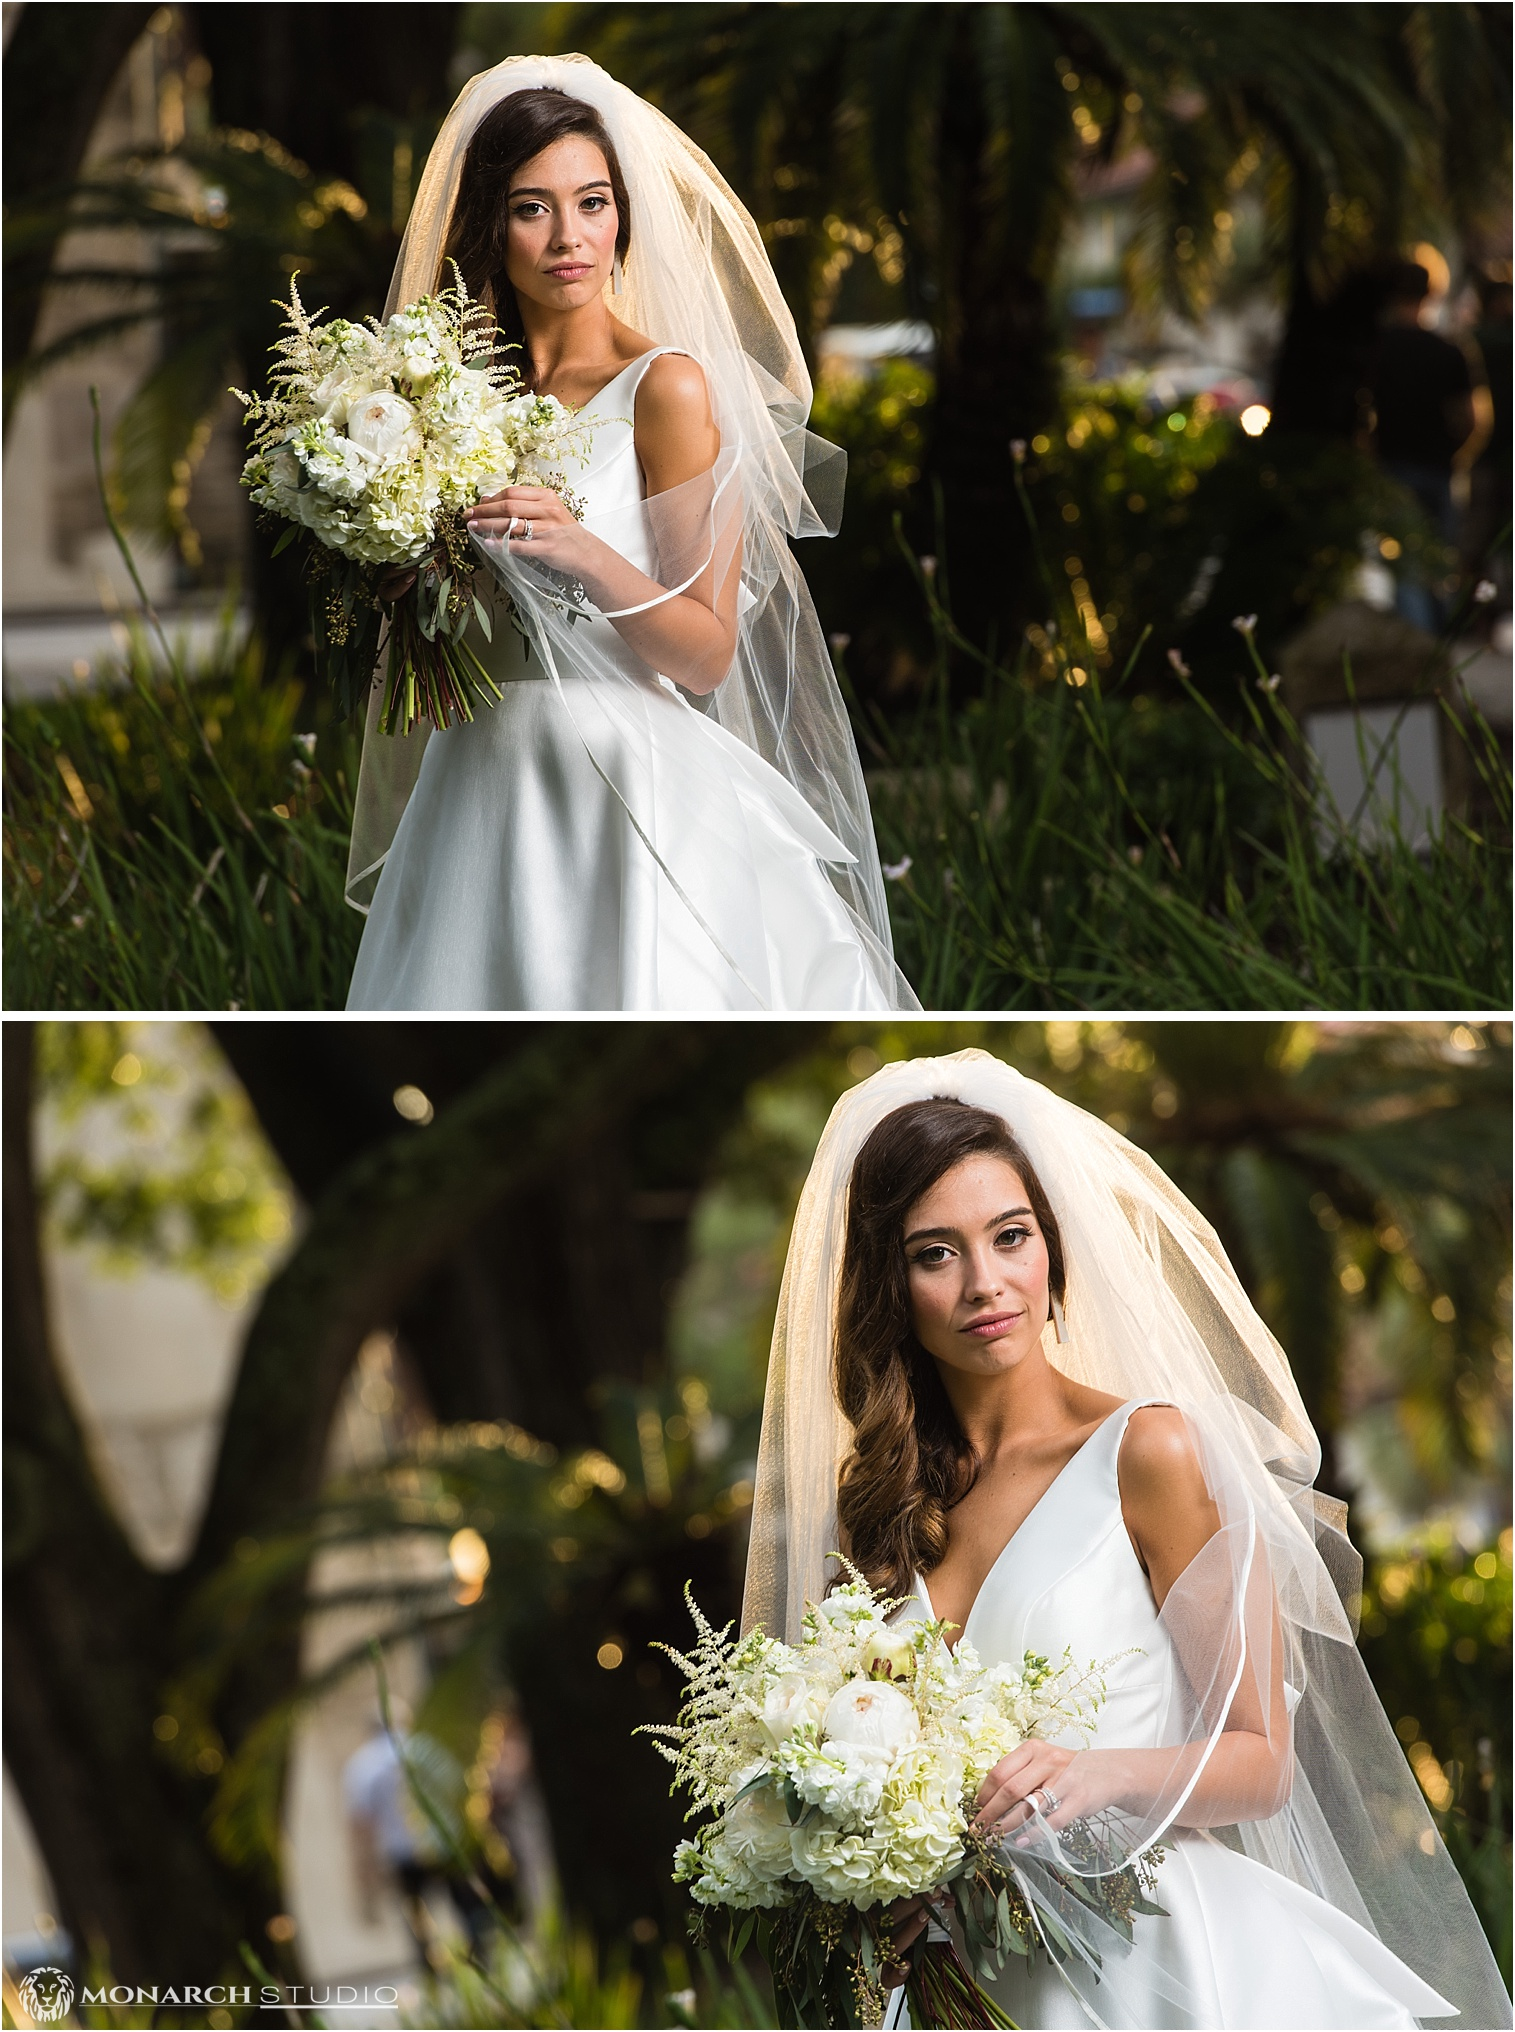 st-augustine-wedding-photographer-099.jpg